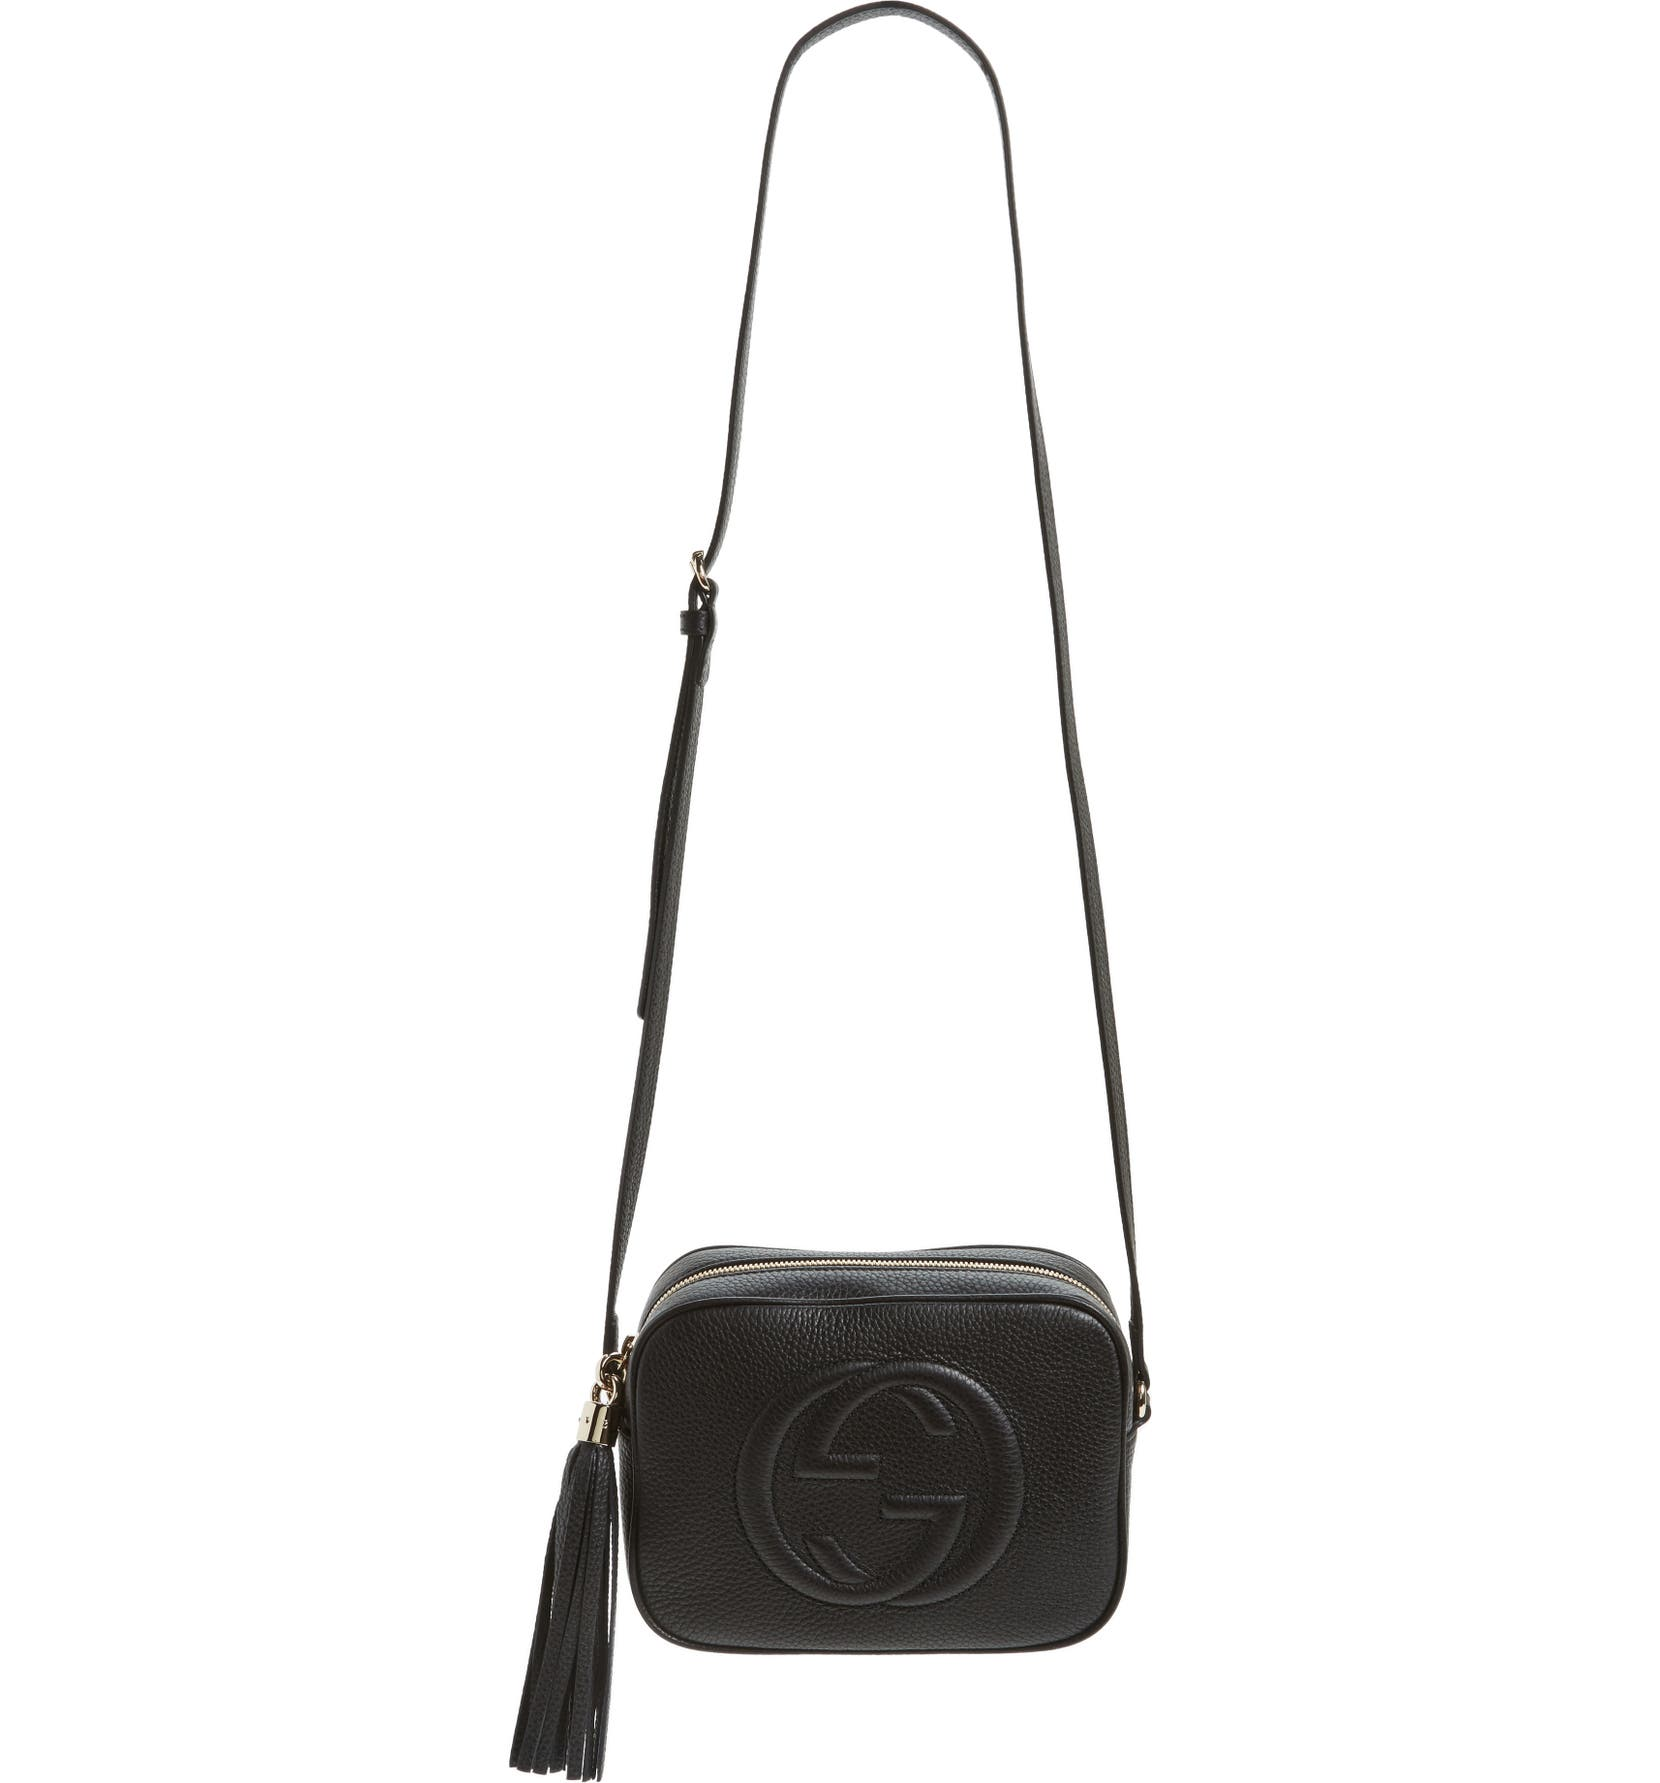 a8b380cd585 Gucci Soho Disco Leather Bag